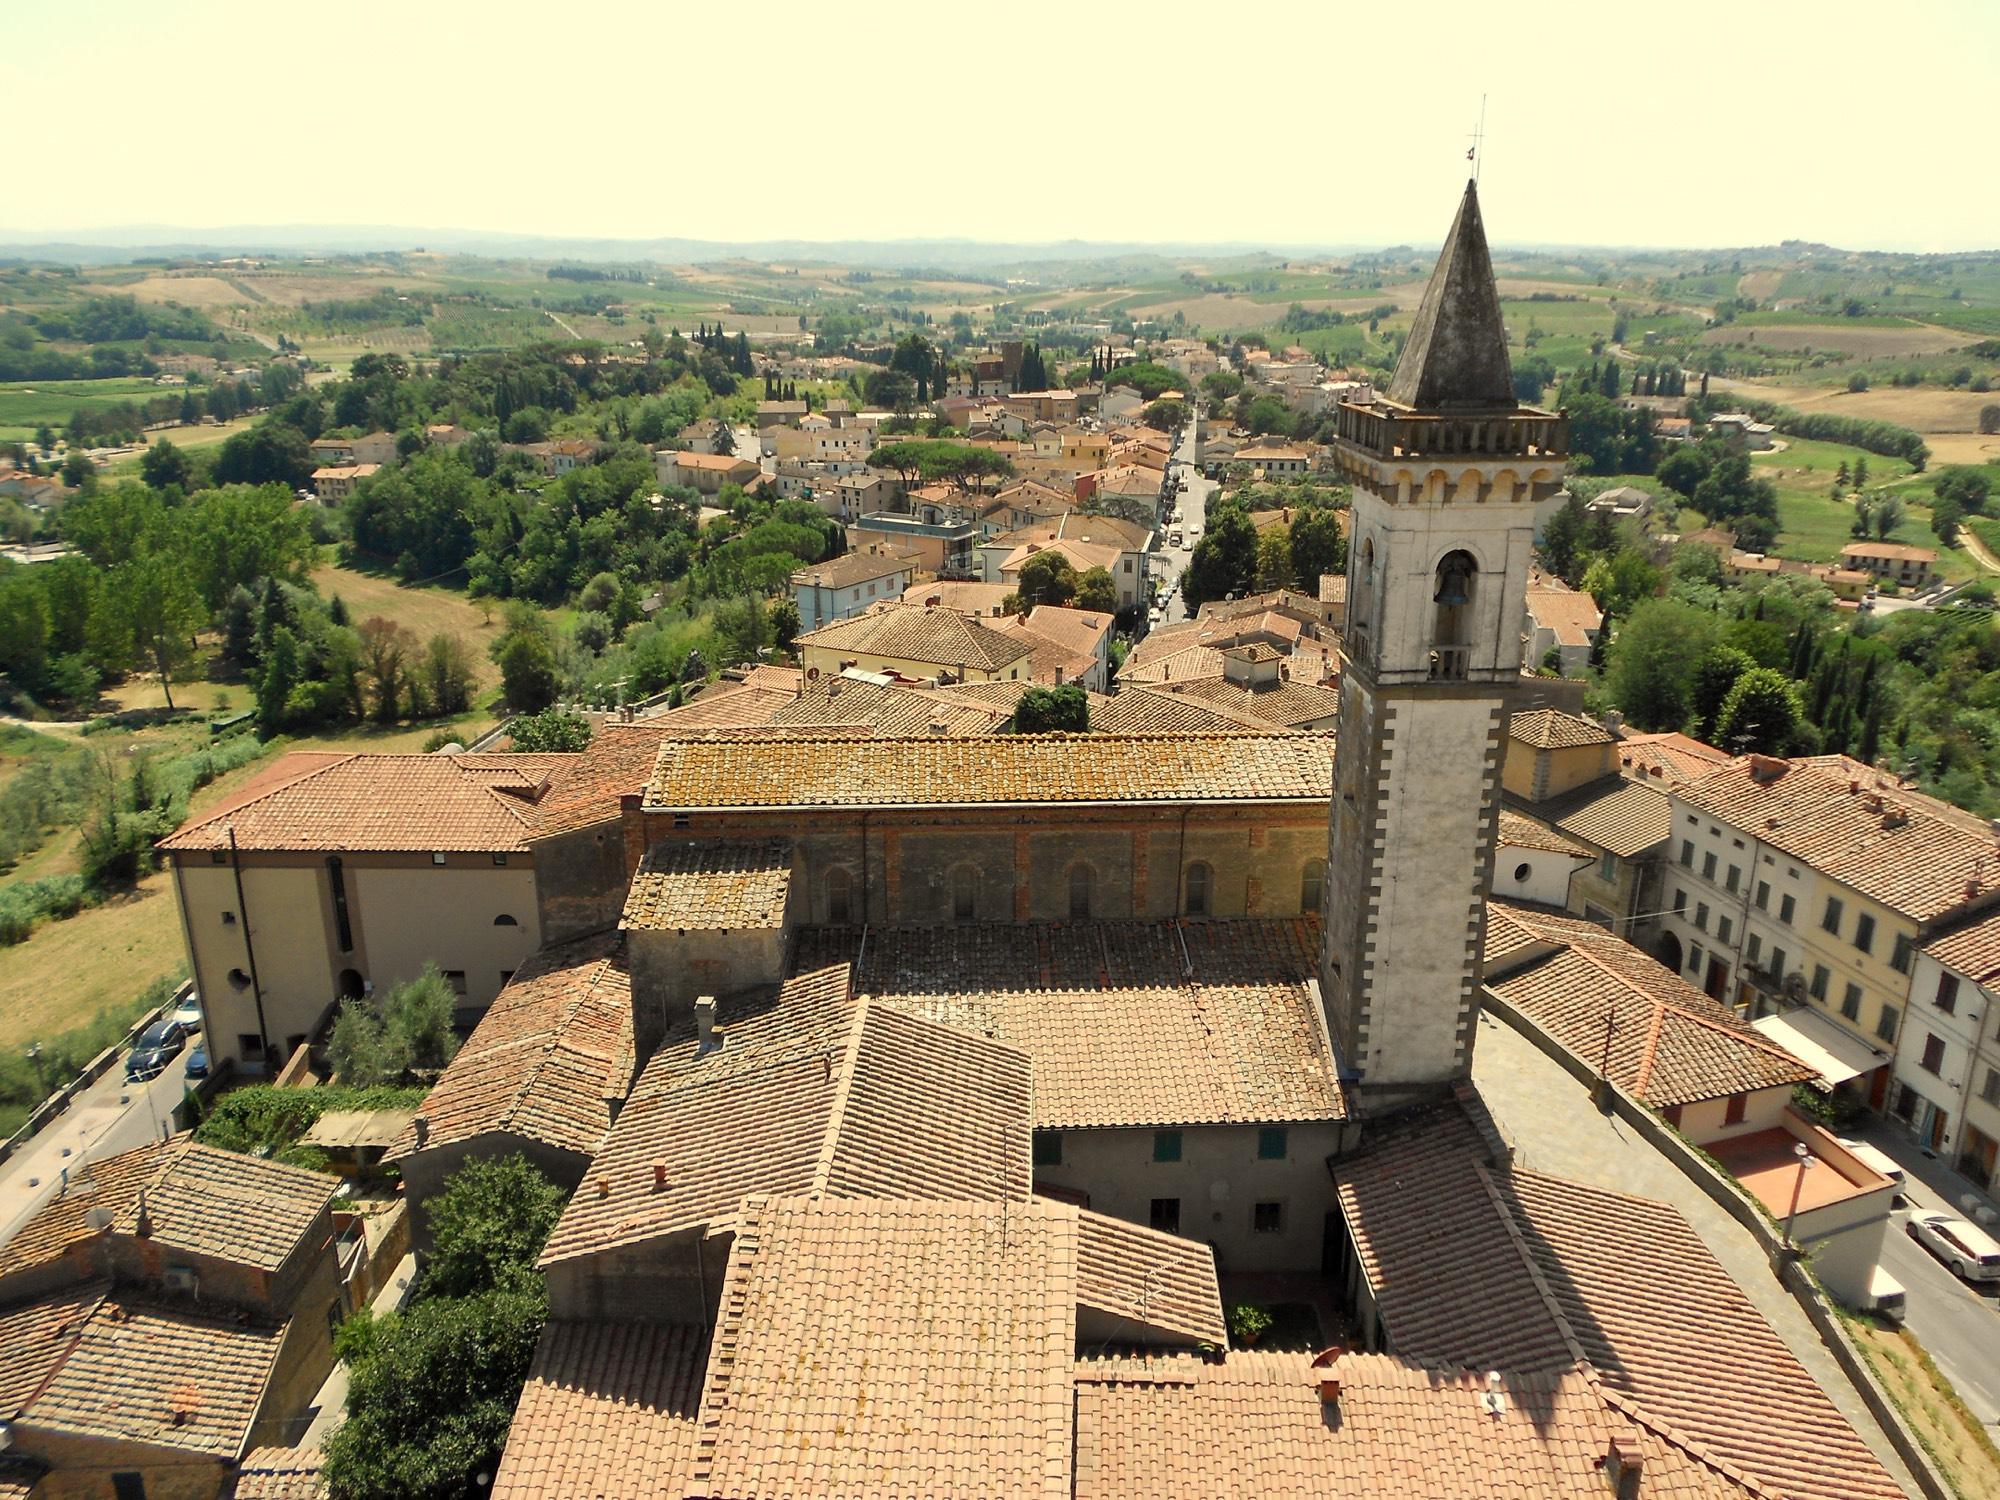 Agriturismo-la-gioconda-Vinci-Firenze-Vinci Tuscany Italy 1